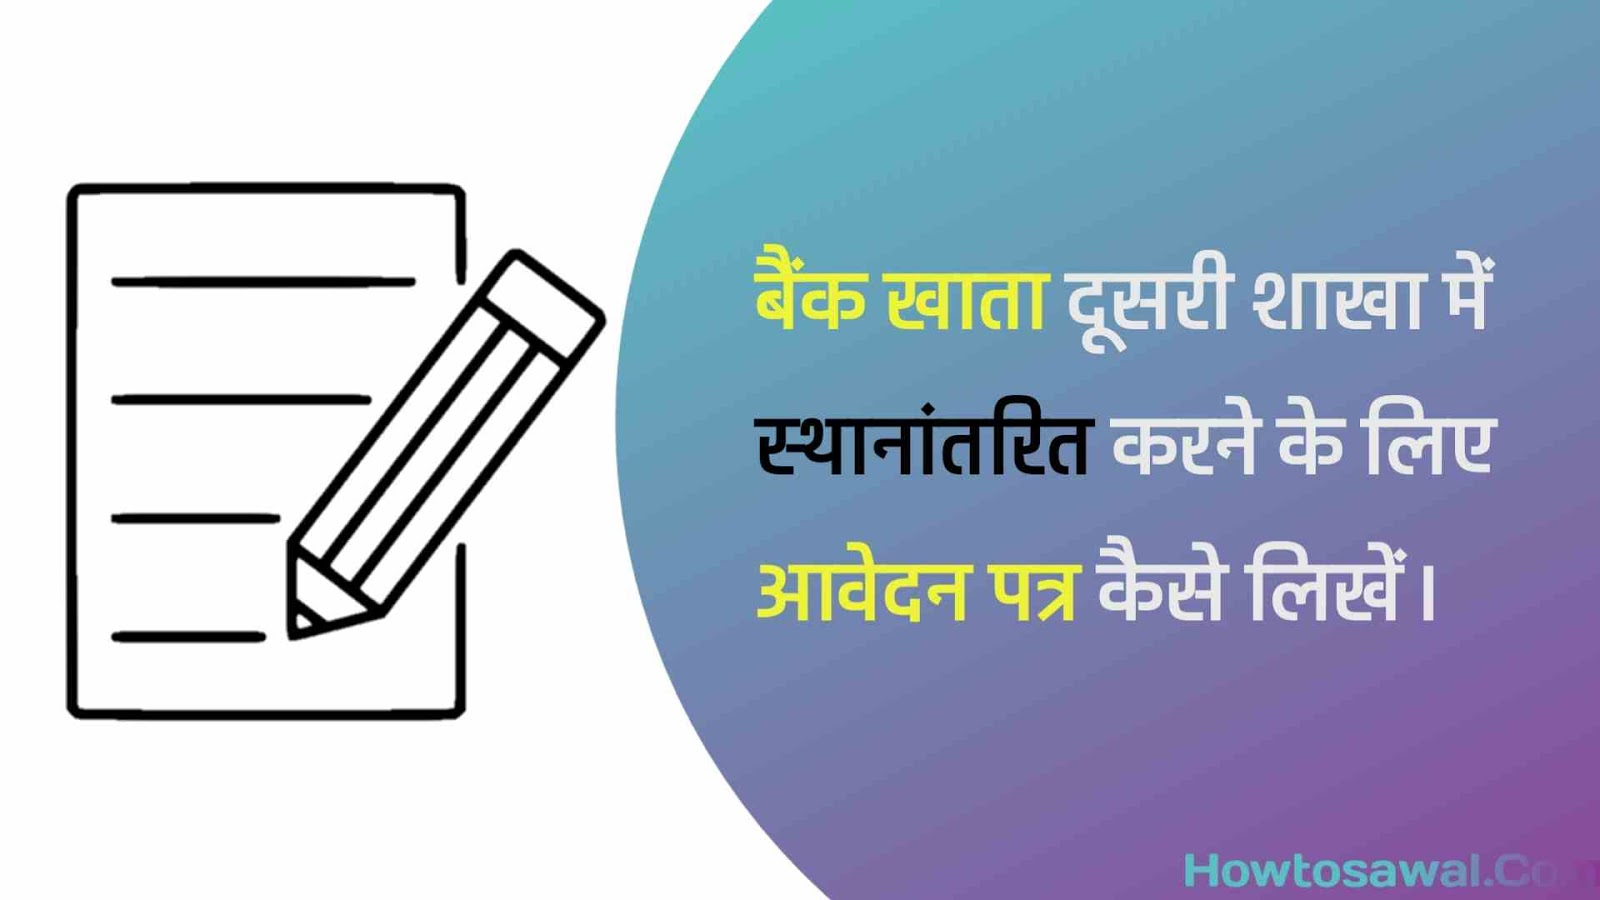 Bank Shakha Transfer Karne Ke Liye Application Letter In Hindi 2019 Howtosawal.com